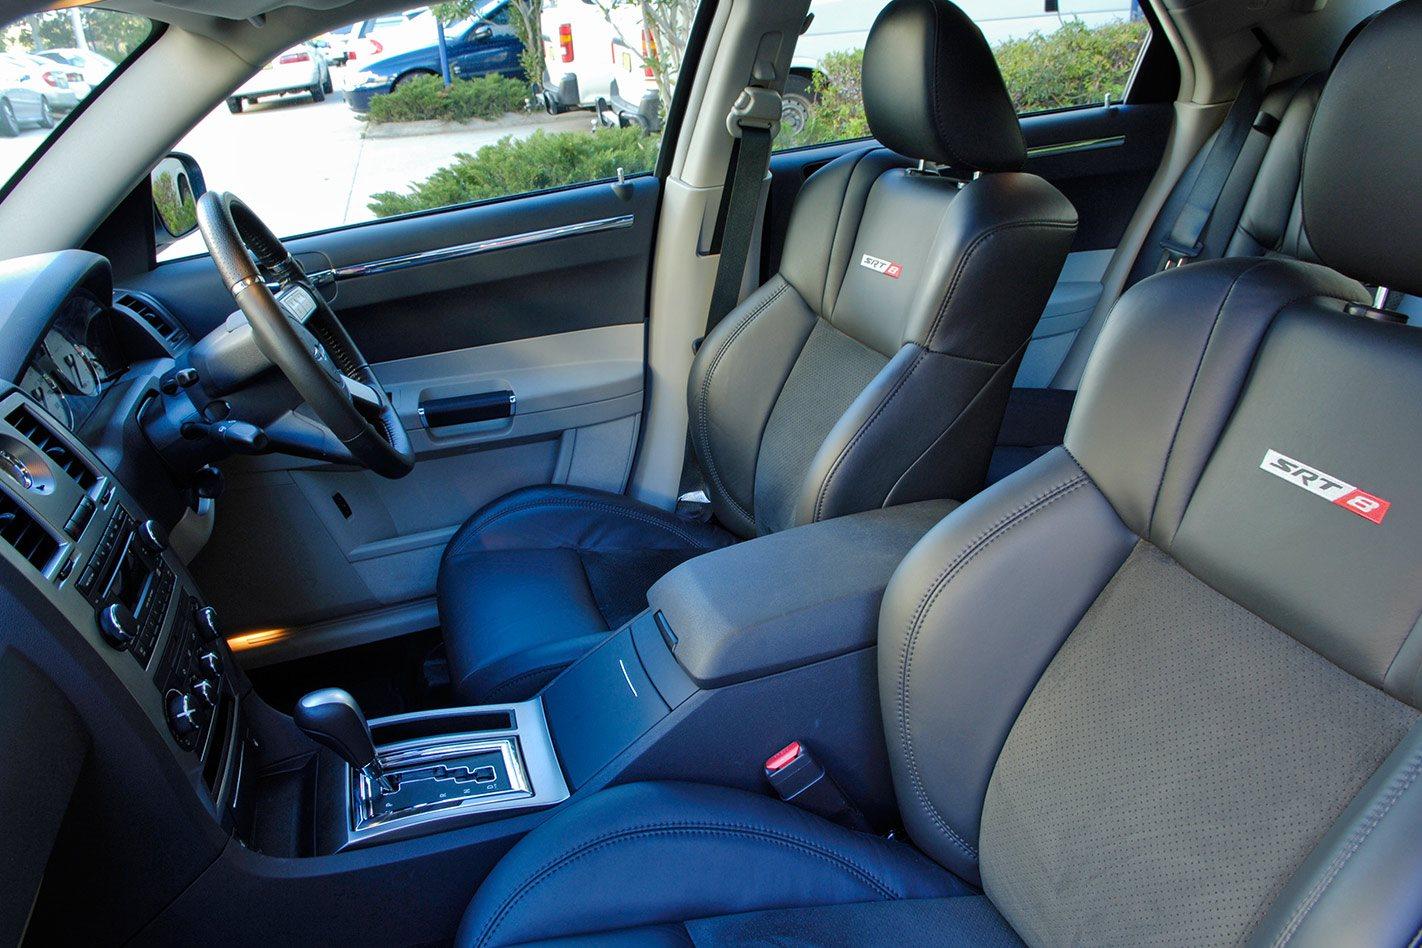 CHRYSLER 300C/300/SRT8 - PROJECT CAR BUYER\'S GUIDE